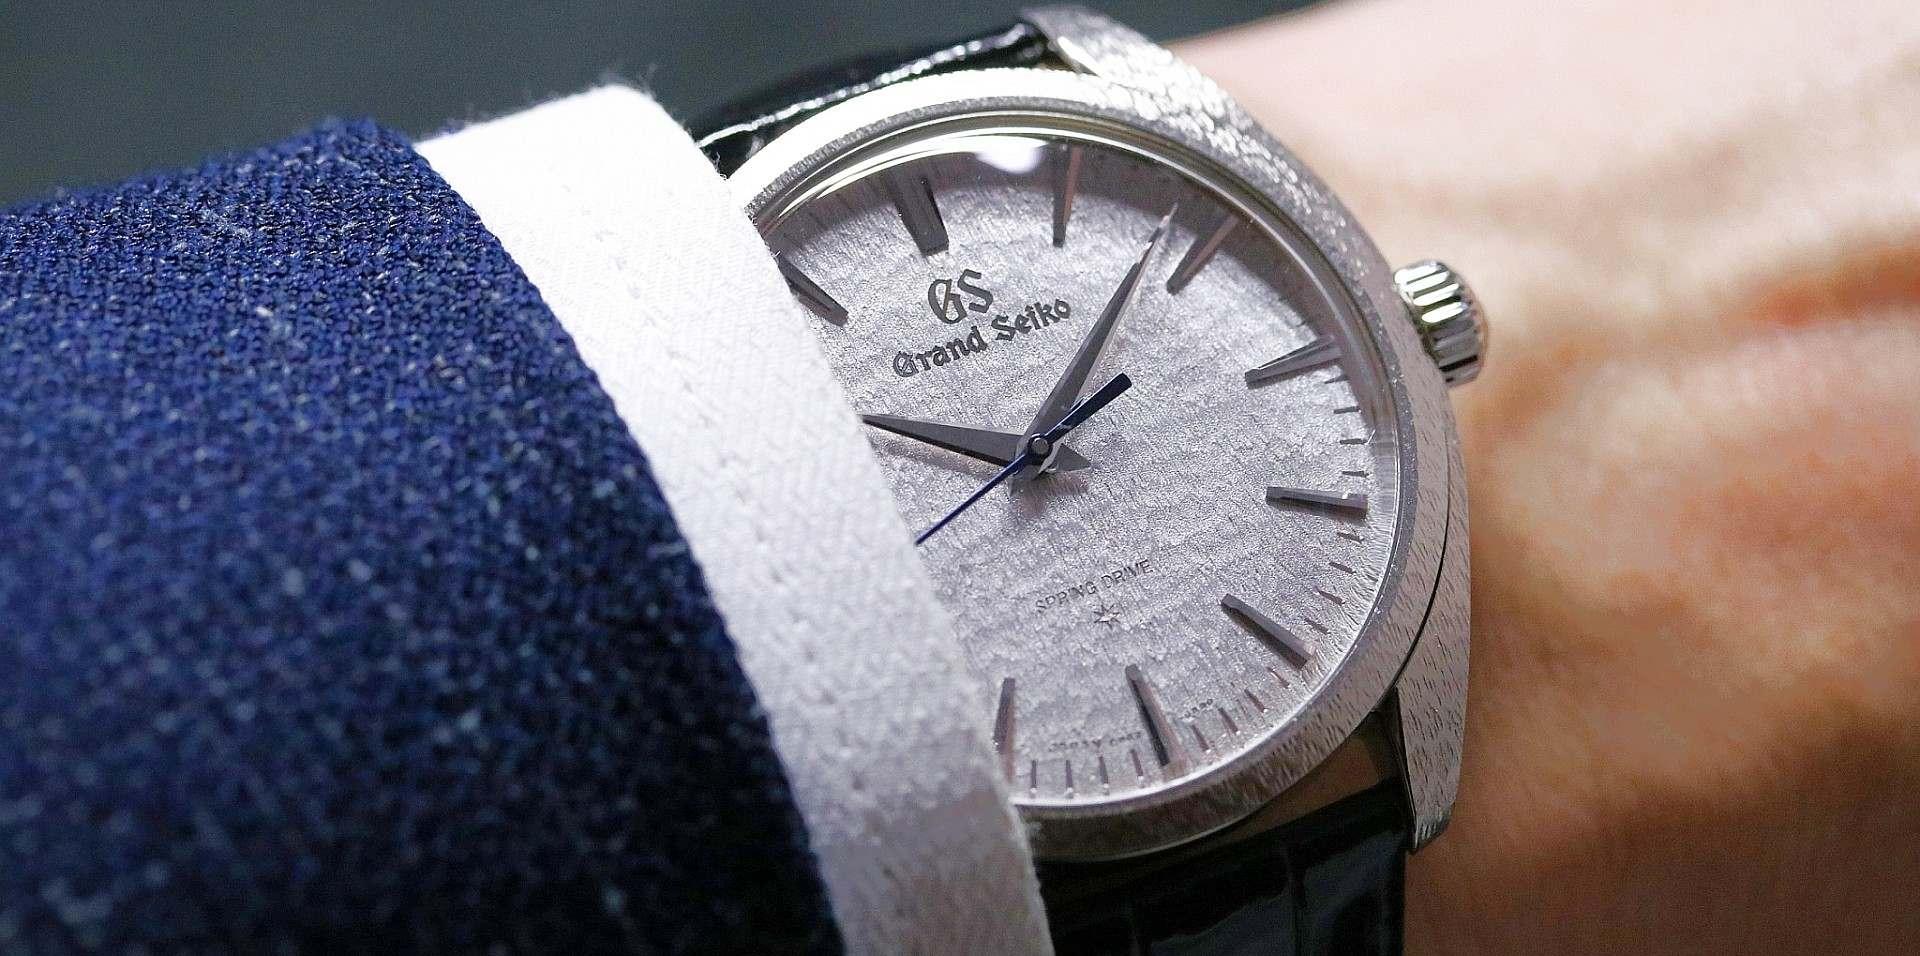 【2019 BASEL錶展報導】Grand Seiko Elegance Collection推出 Spring Drive 20 週年紀念腕錶